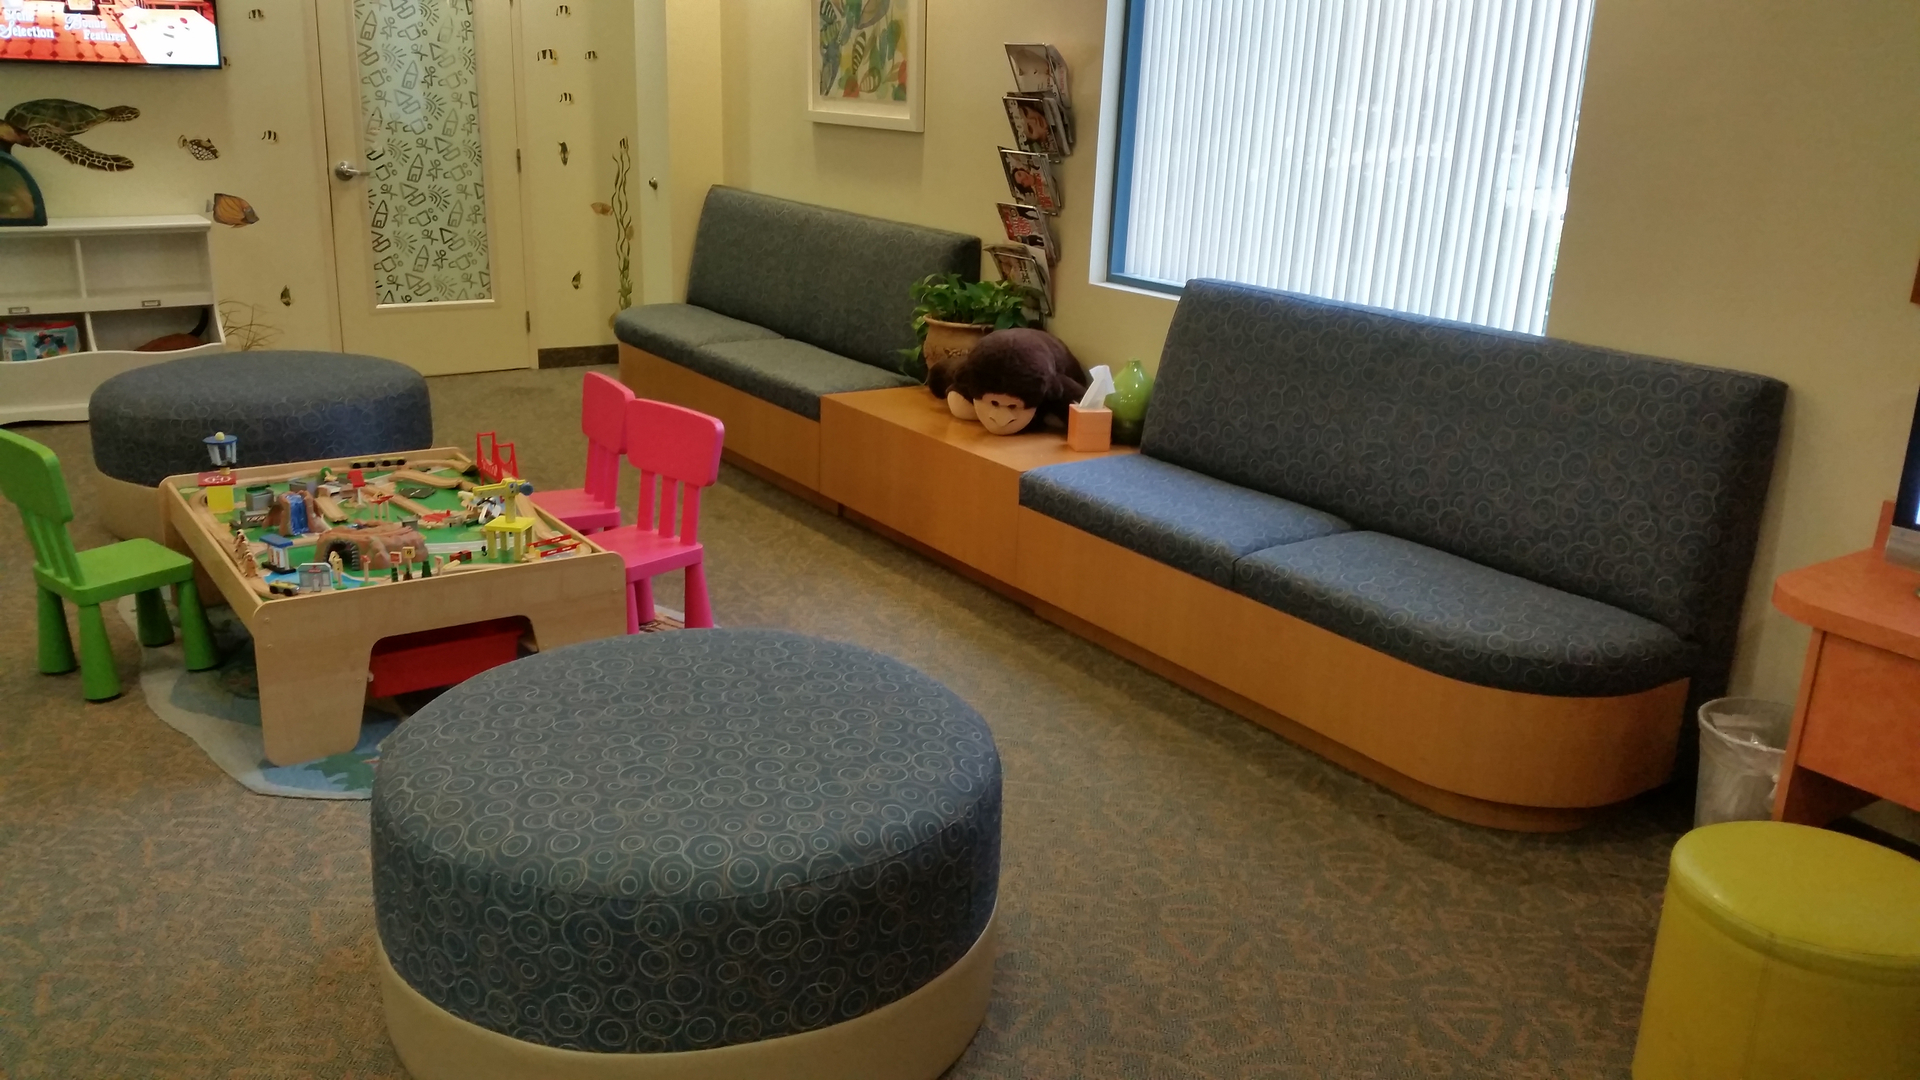 Eastlake Upholstery Furniture Upholstery Furniture Repair - Furniture upholstery san diego